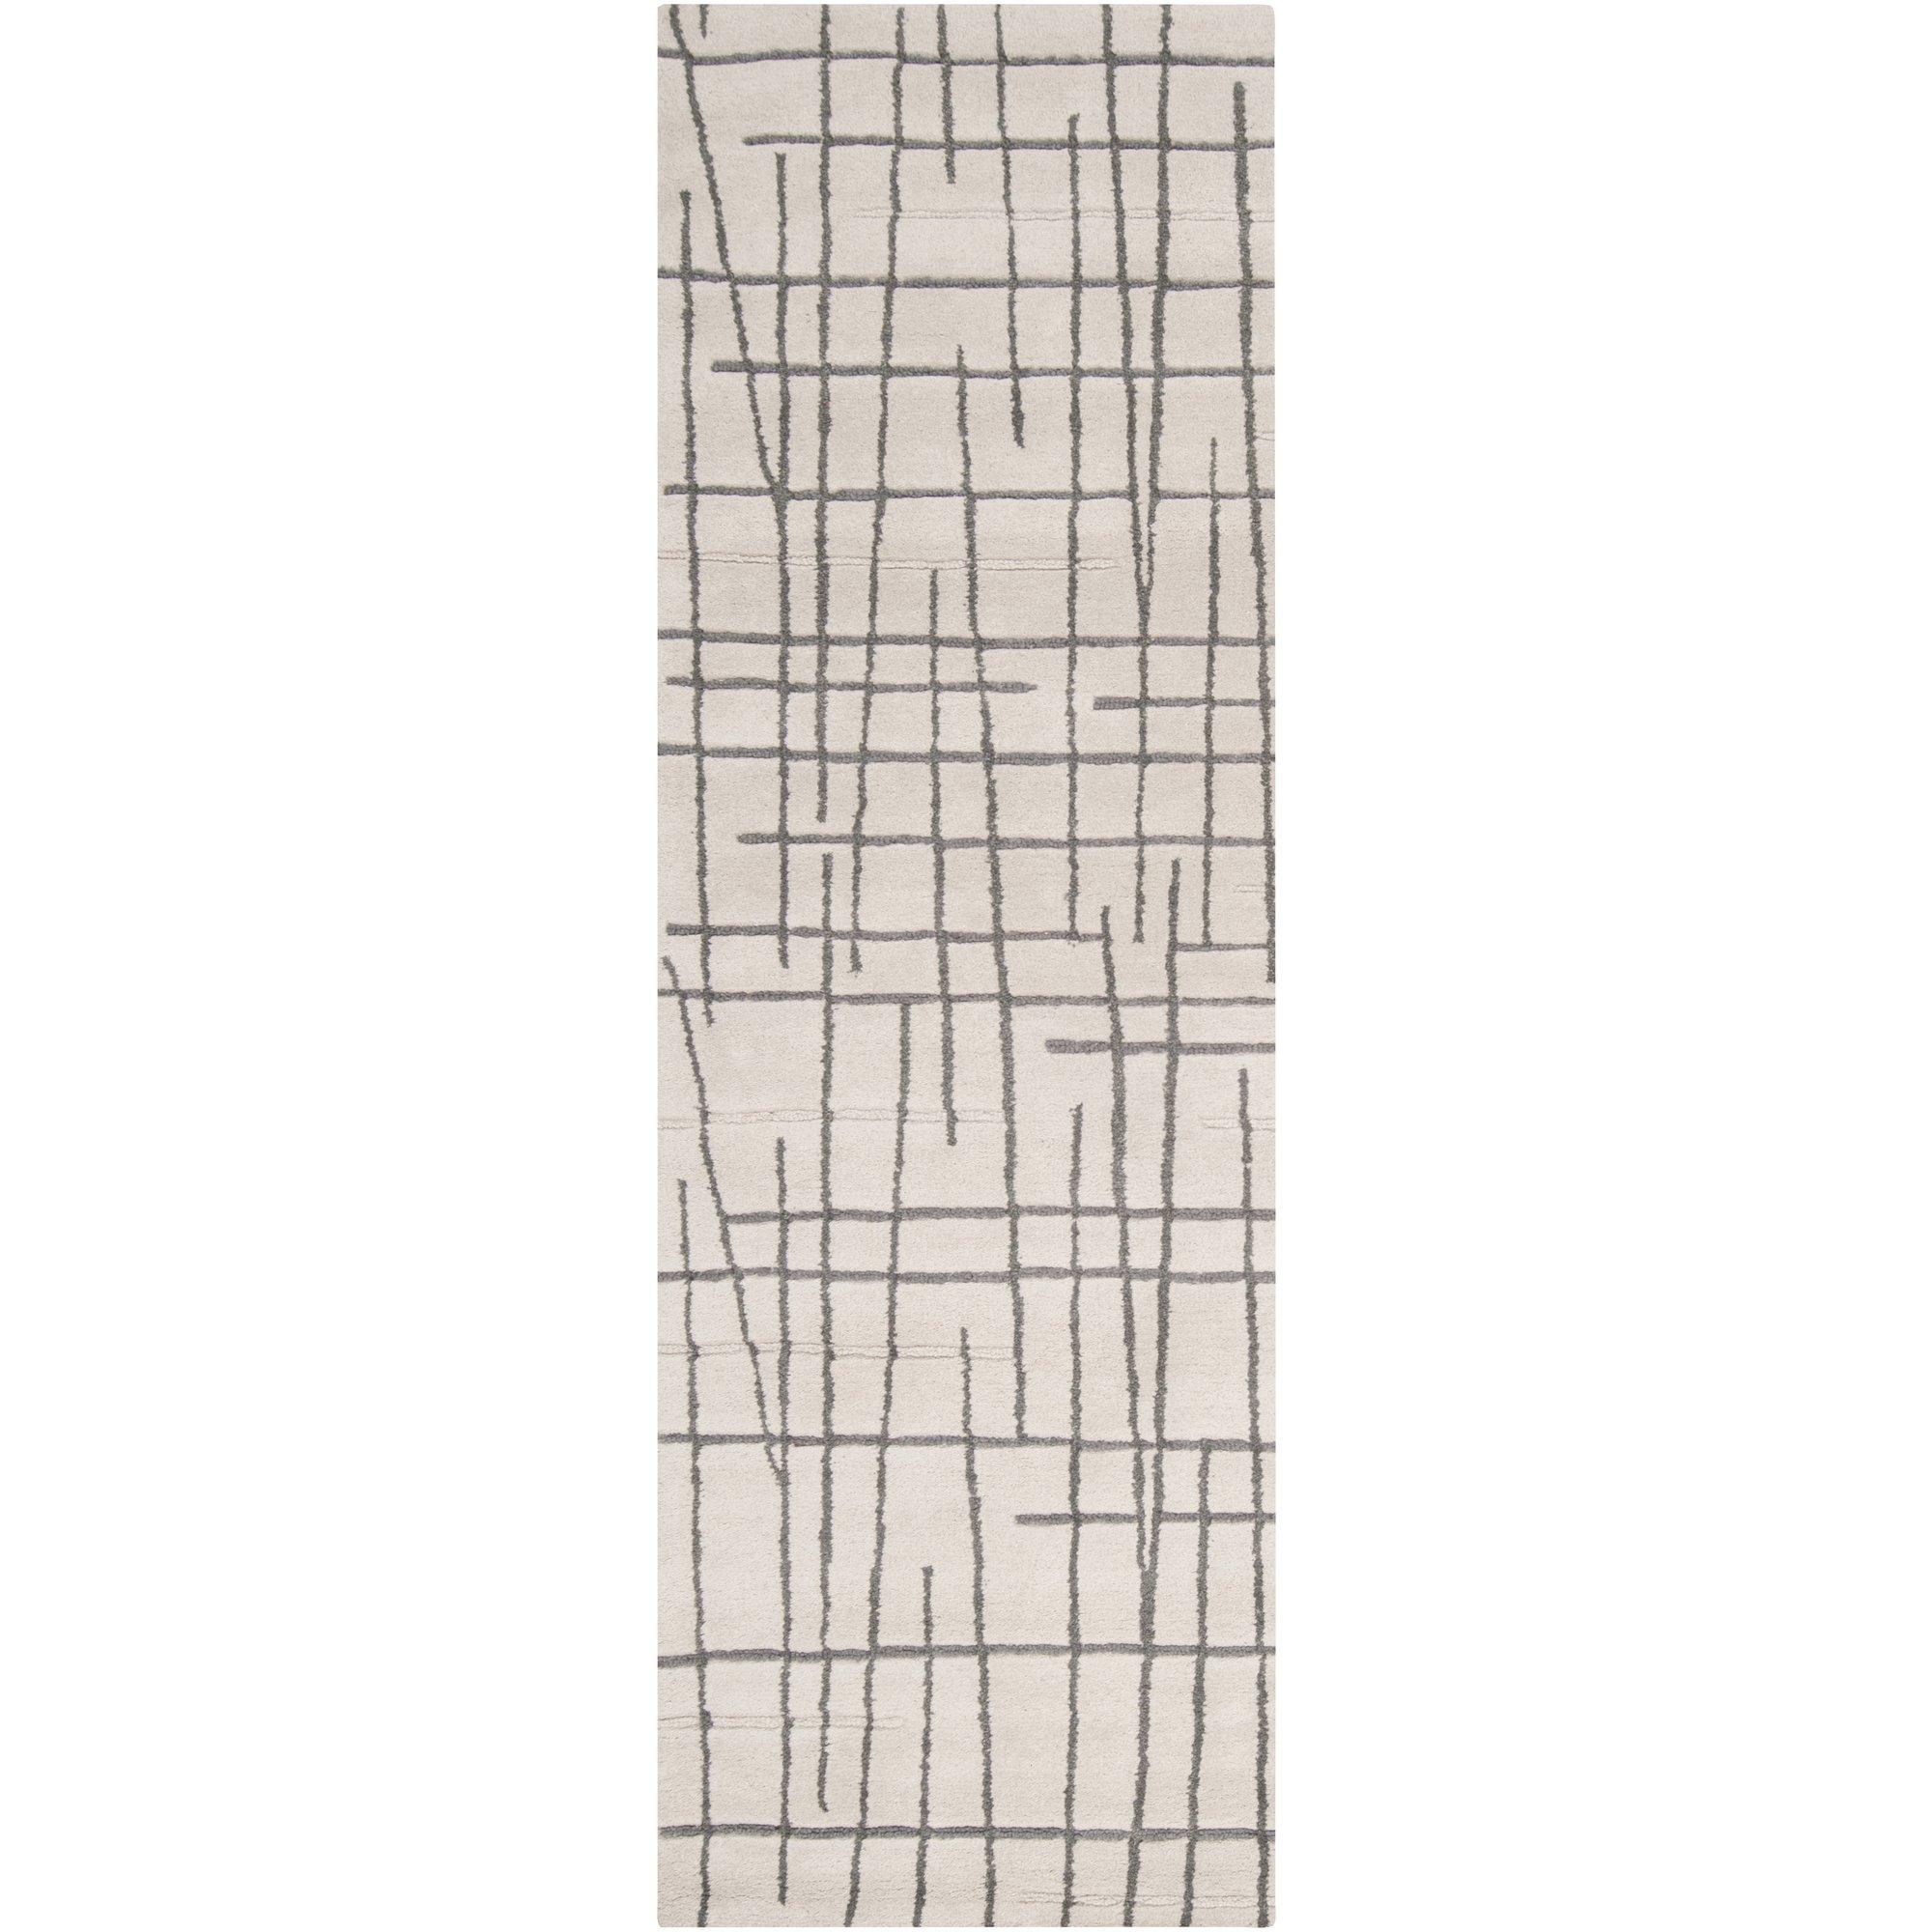 Surya Naya NY-5213 Contemporary Hand Tufted 100% New Zealand Wool Ivory 2'6'' x 8' Geometric Runner